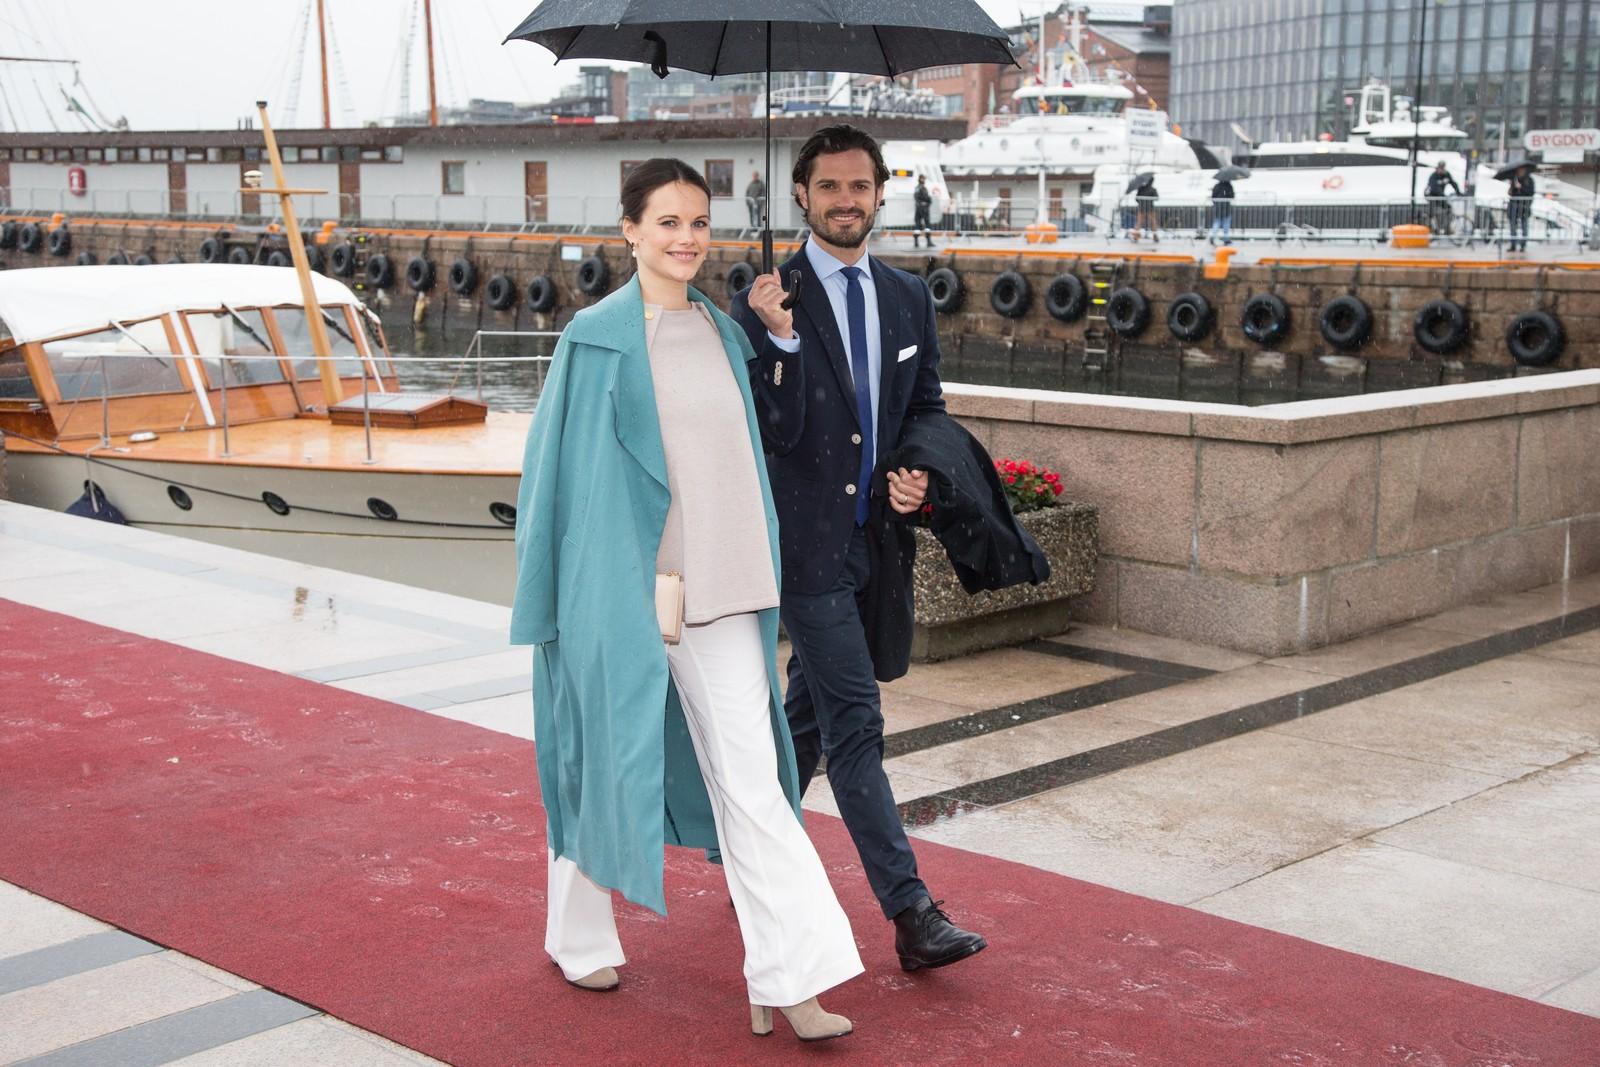 Prins Carl Philip og prinsesse Sofia fra Sverige ved ankomst på Honnørbrygga i Oslo etter lunsj på Kongeskipet Norge onsdag.